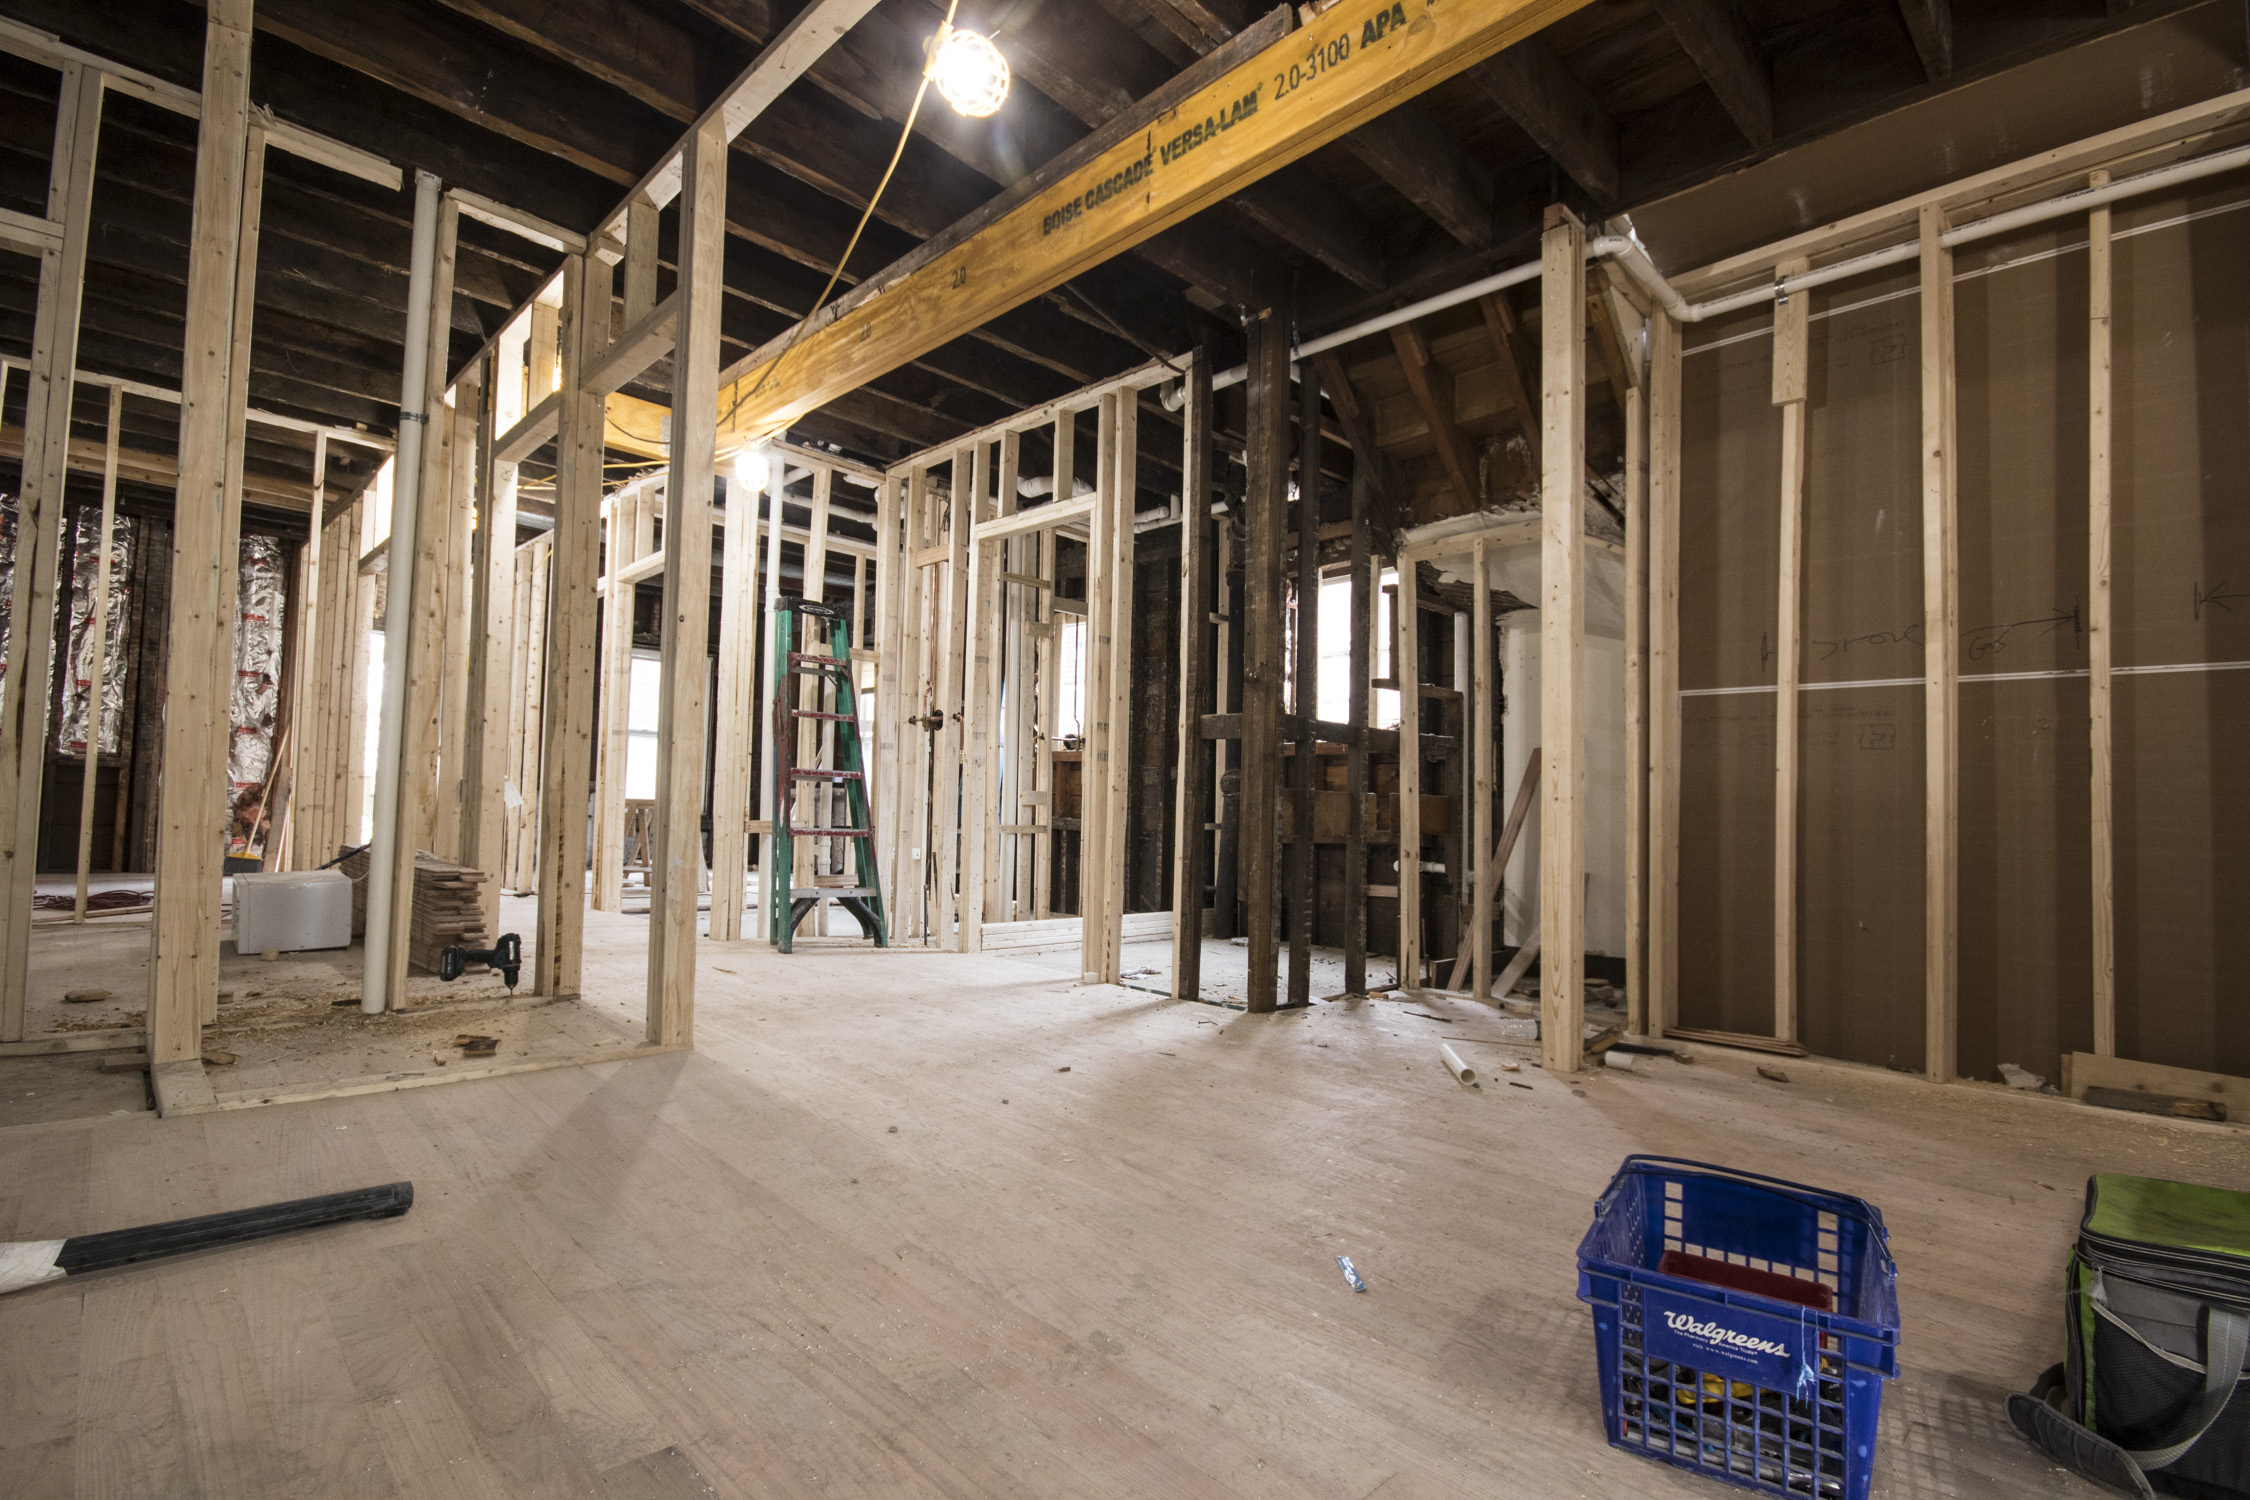 25 darling street homer enovation boston general contractors_19